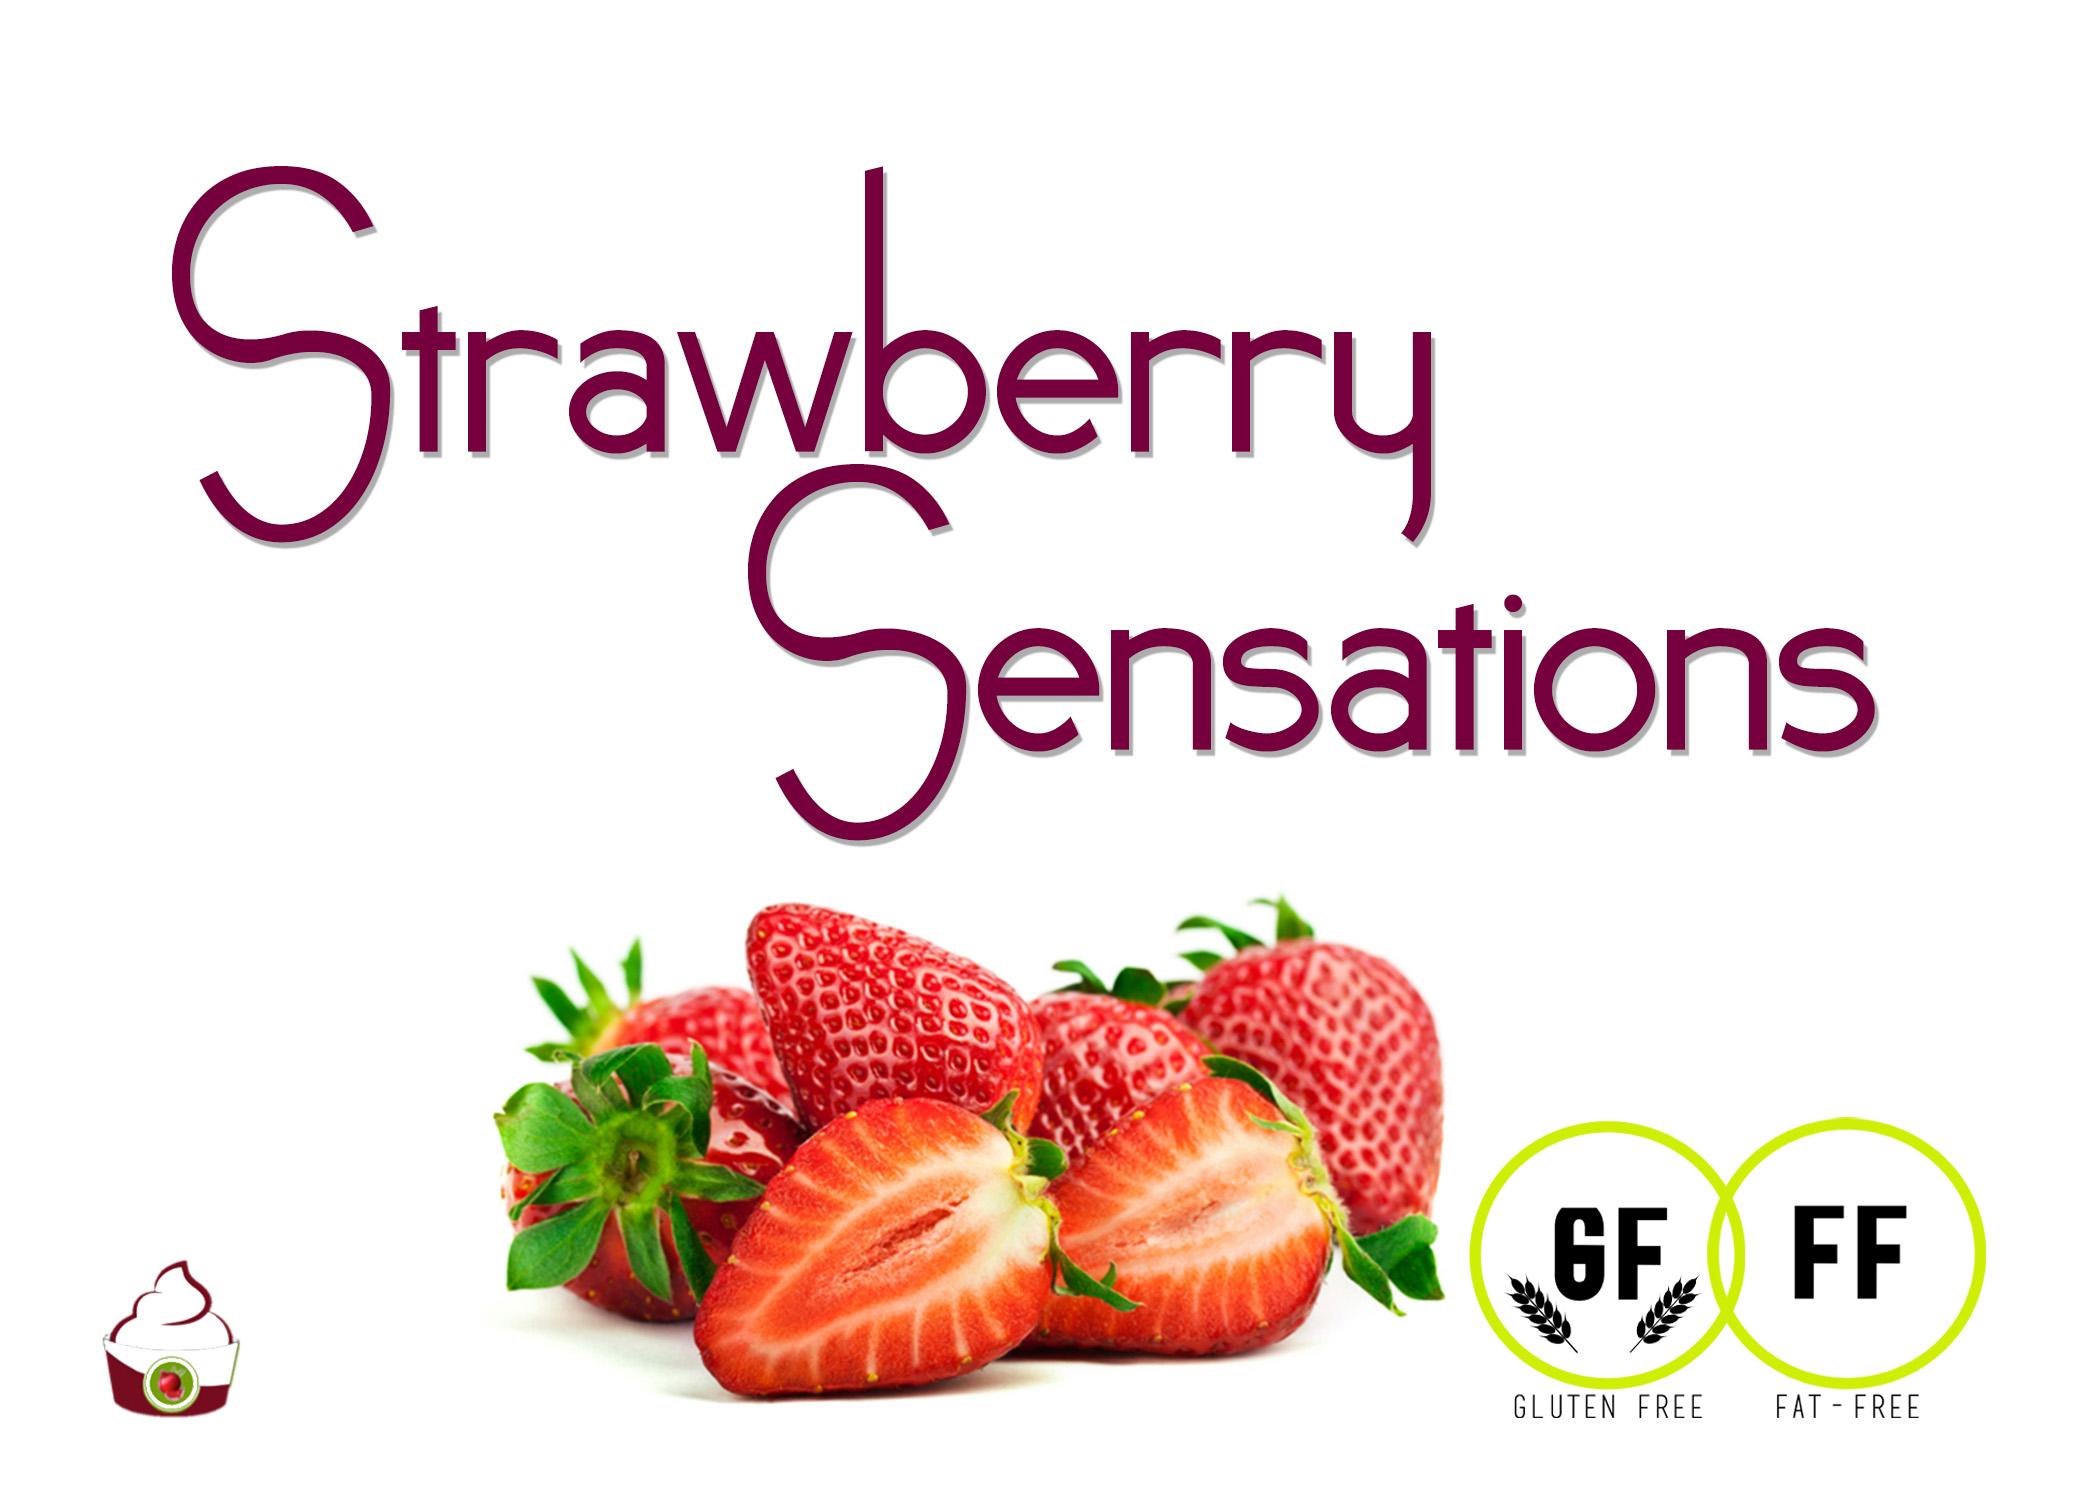 strawberry sensations.jpg